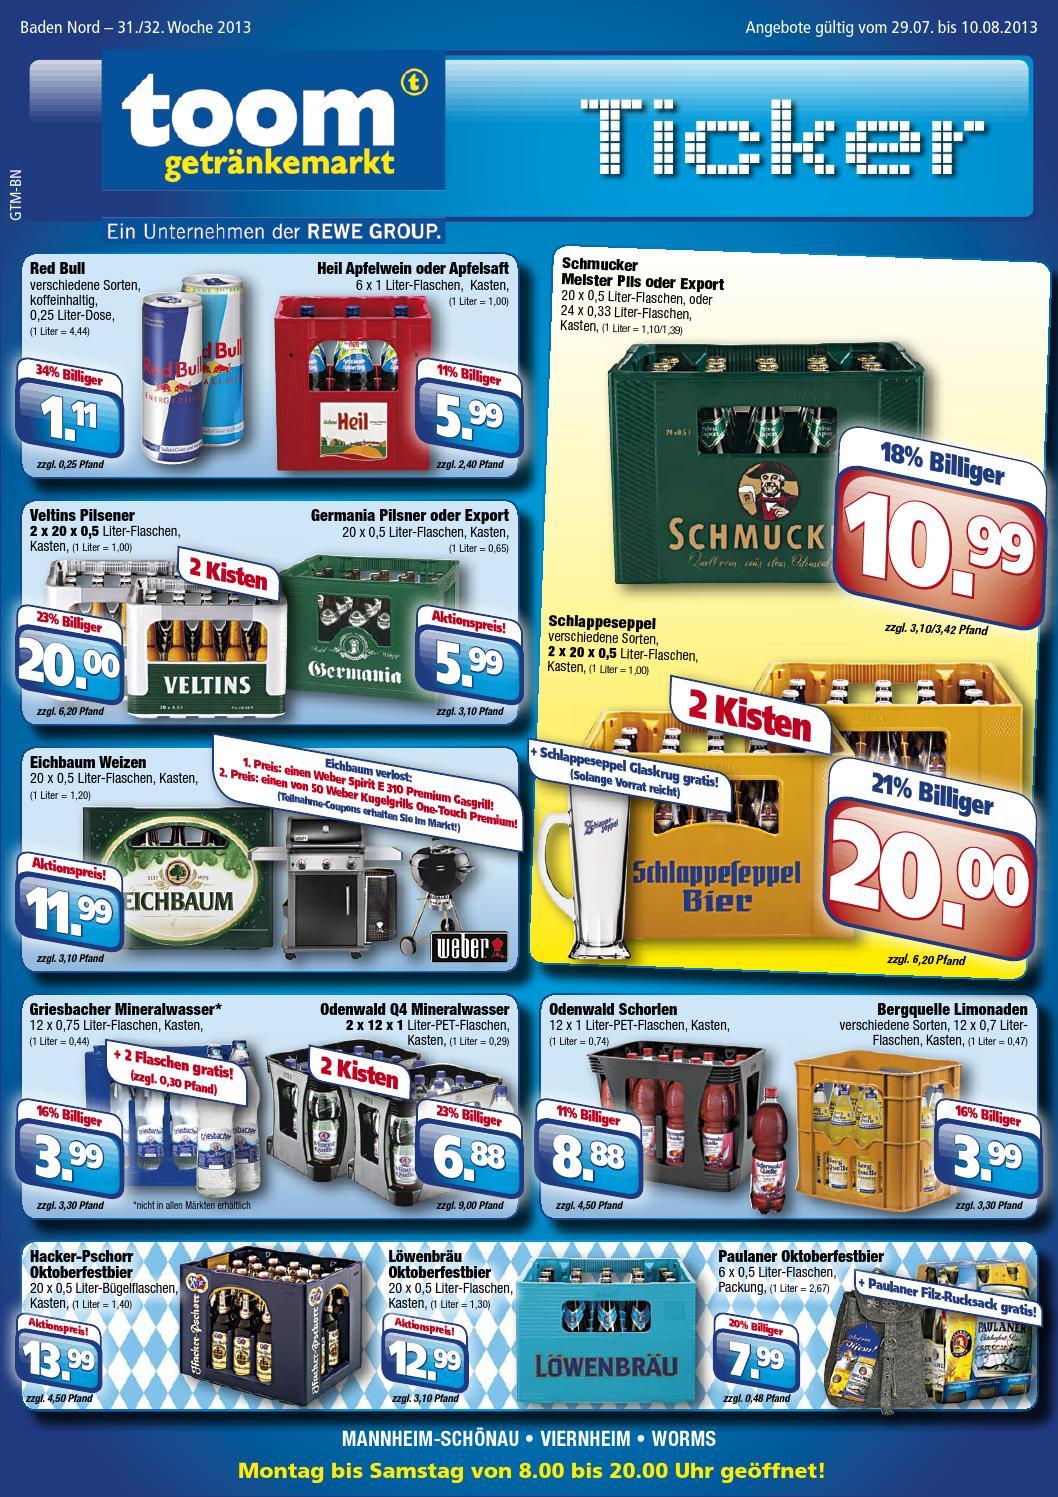 Toom Getränkemarkt Katalog gültig bis 10/08 by broshuri - issuu